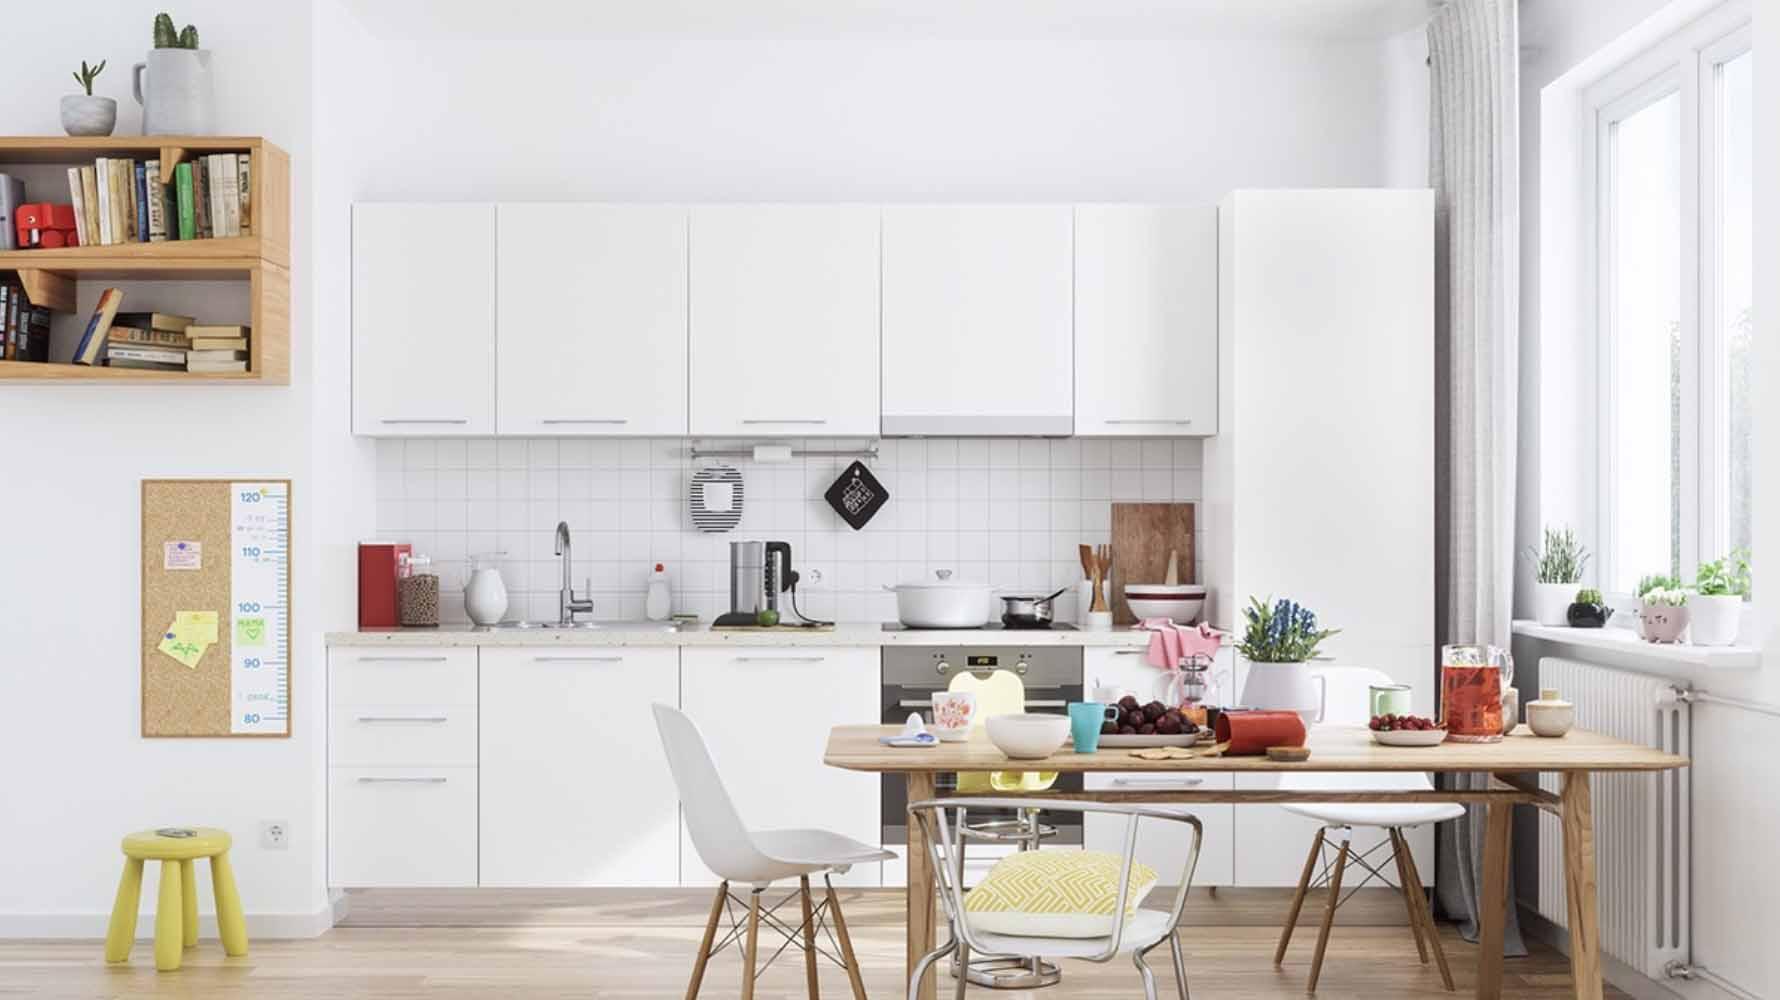 Minimalist Kitchen Design Ideas HDB Singapore - 2 - Style ...